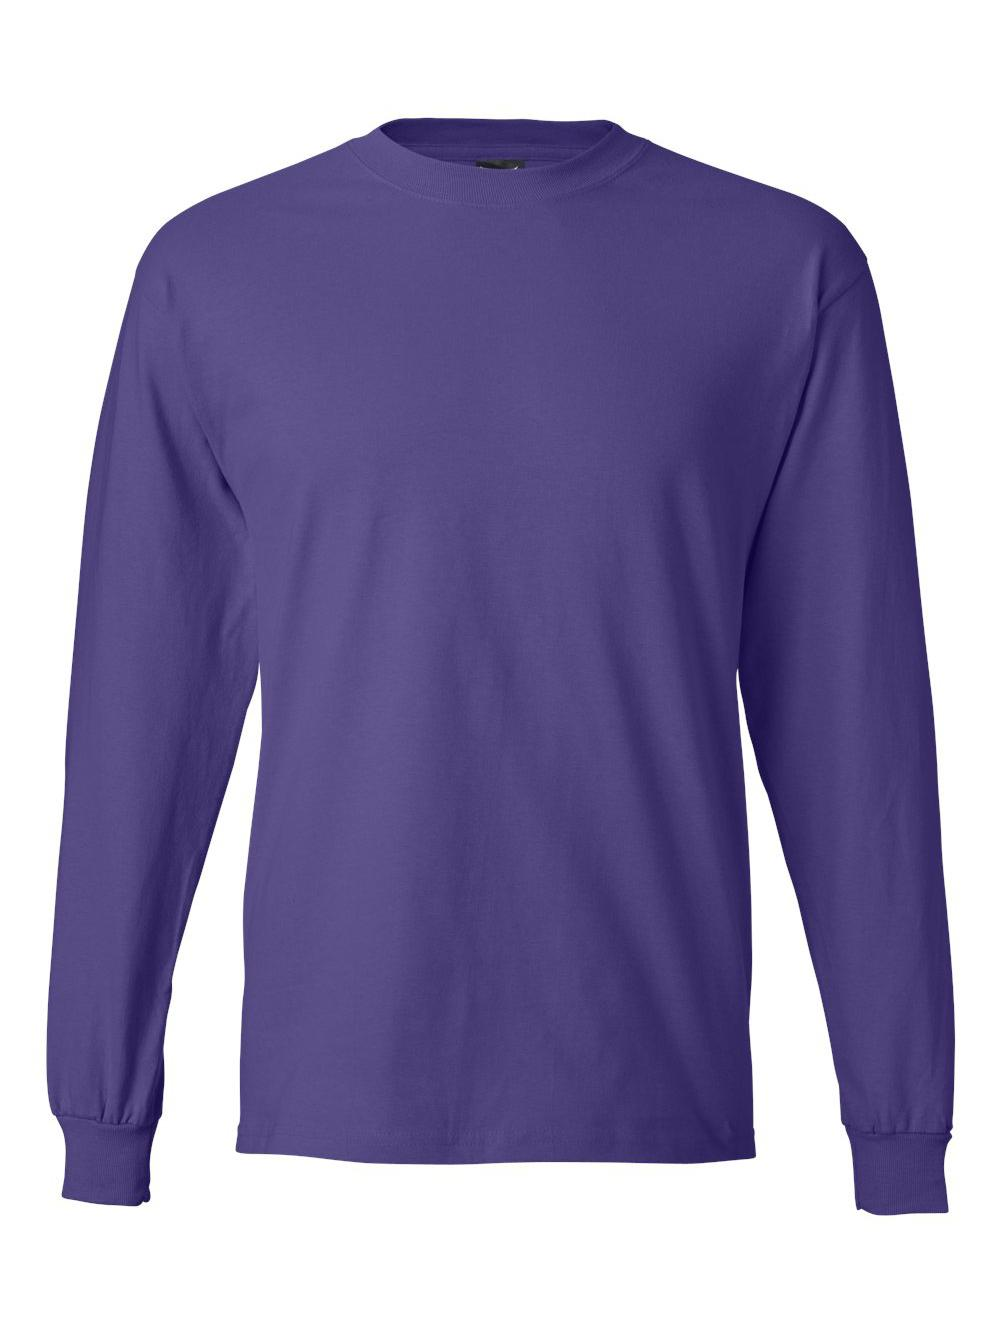 Hanes-Beefy-T-Long-Sleeve-T-Shirt-5186 thumbnail 45